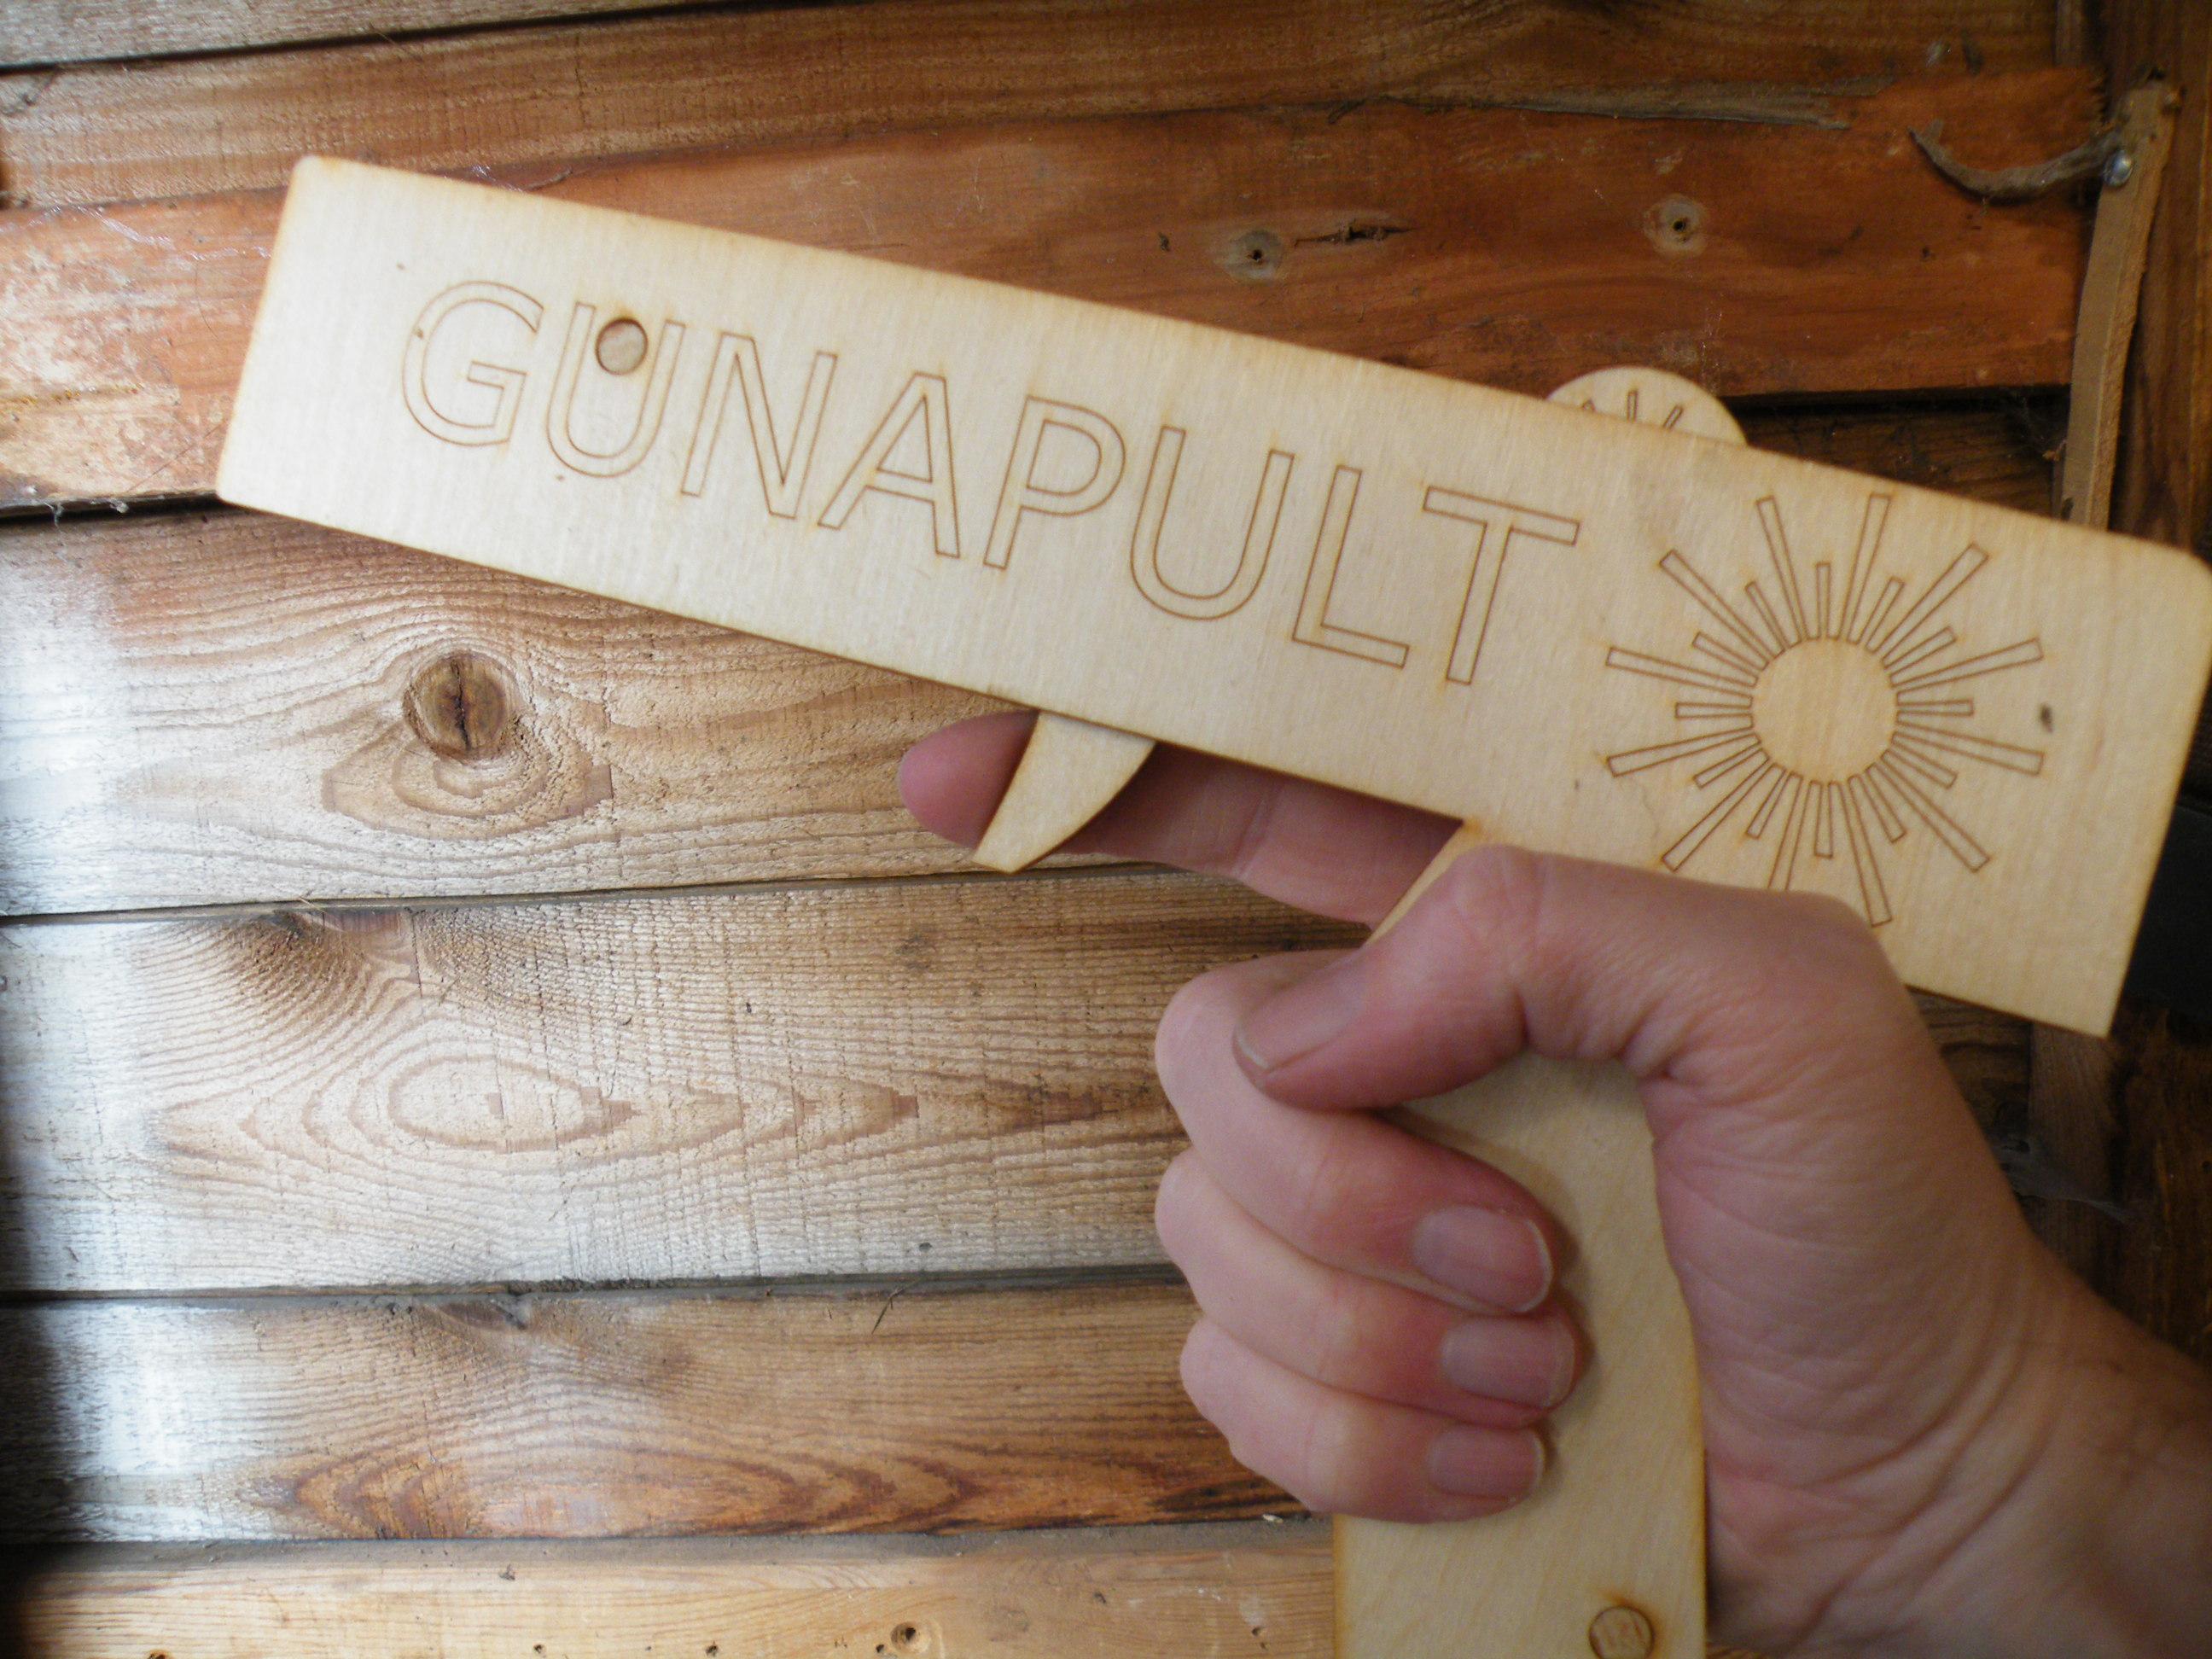 Picture of Gunapult